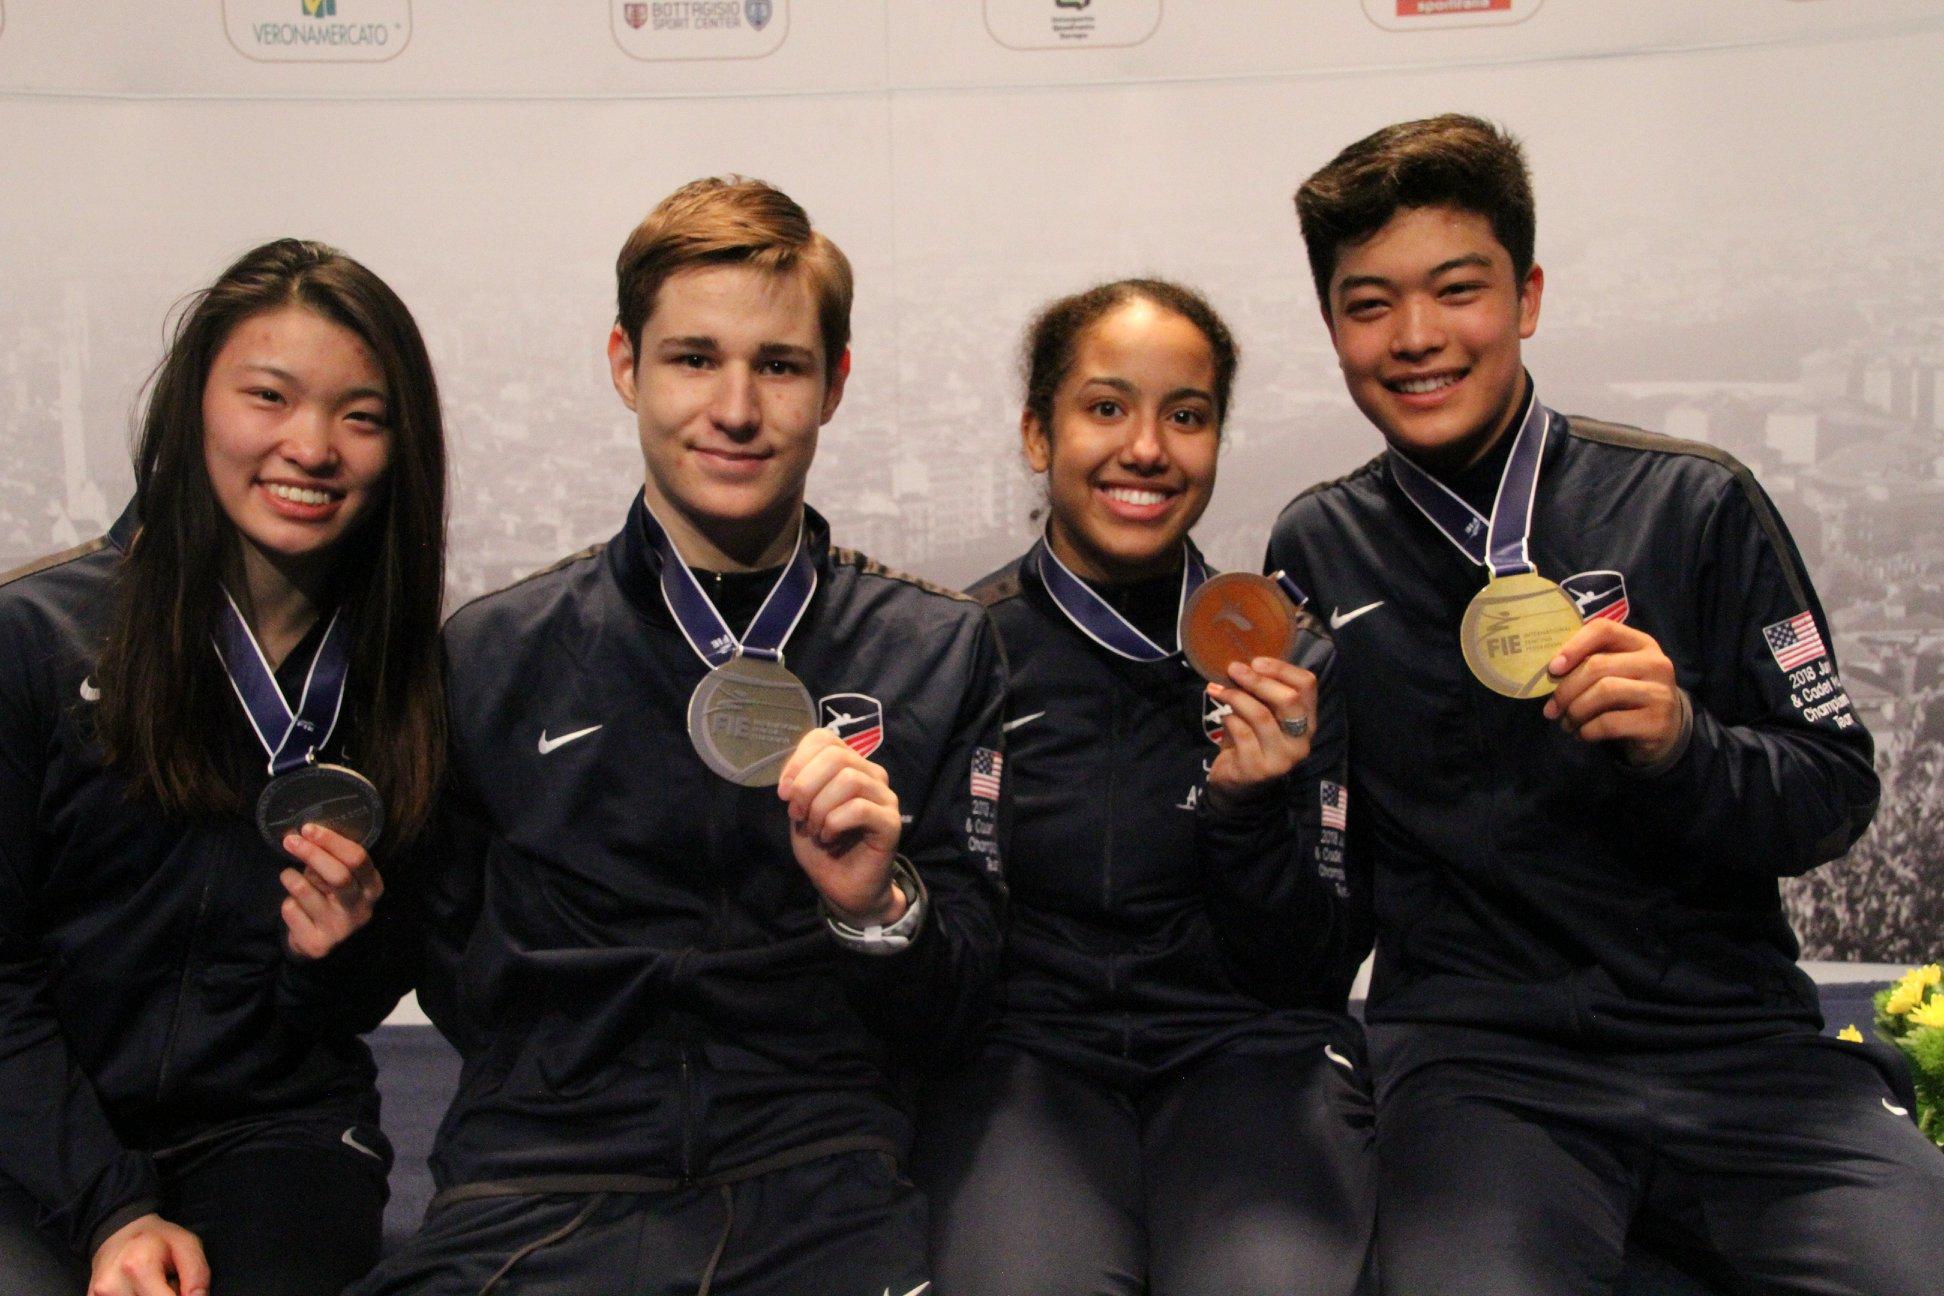 93f4d2ca0d16 Kenji Bravo Wins Cadet World Title, Leads Team USA to Four Foil Medals